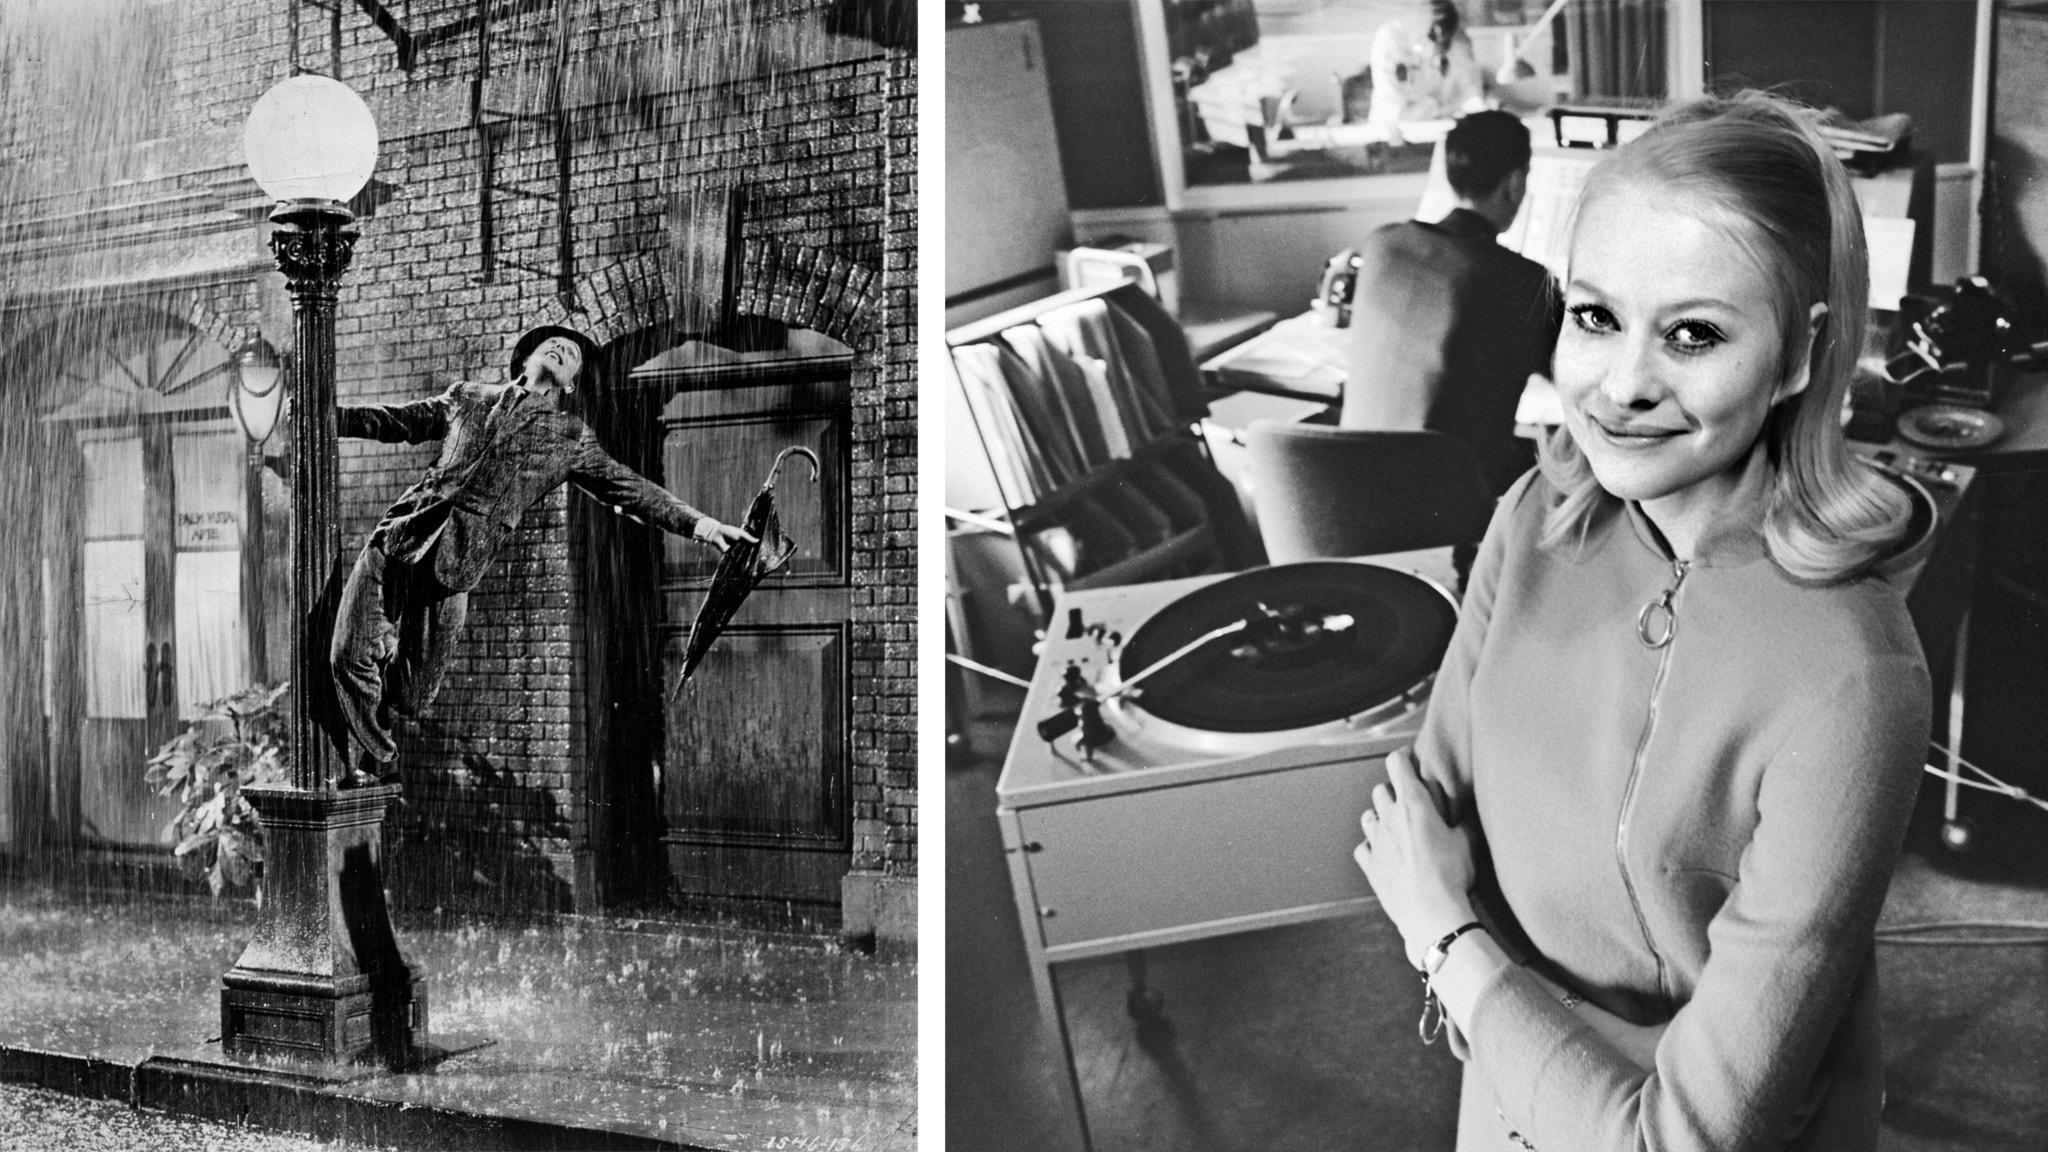 Gene Kelly i den berömda dansscenen Singin´in the rain och Kicki Engerstedt